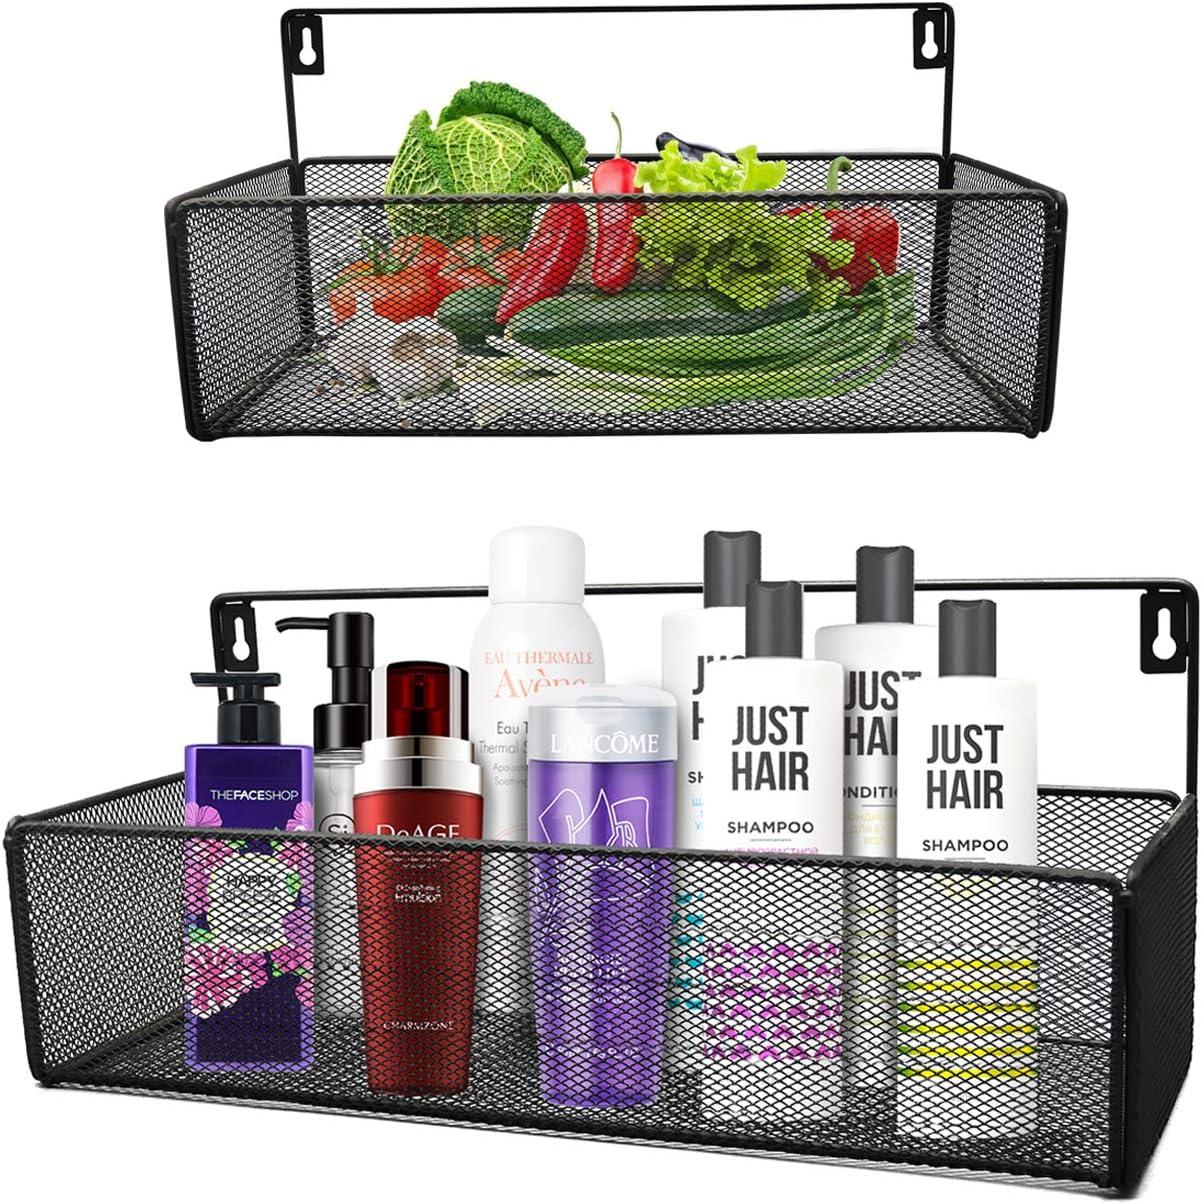 Swallow Bros Bathroom Shelf for Storage, Office Wall Organizers, Kitchen Spice Rack, 2 Pack, Black